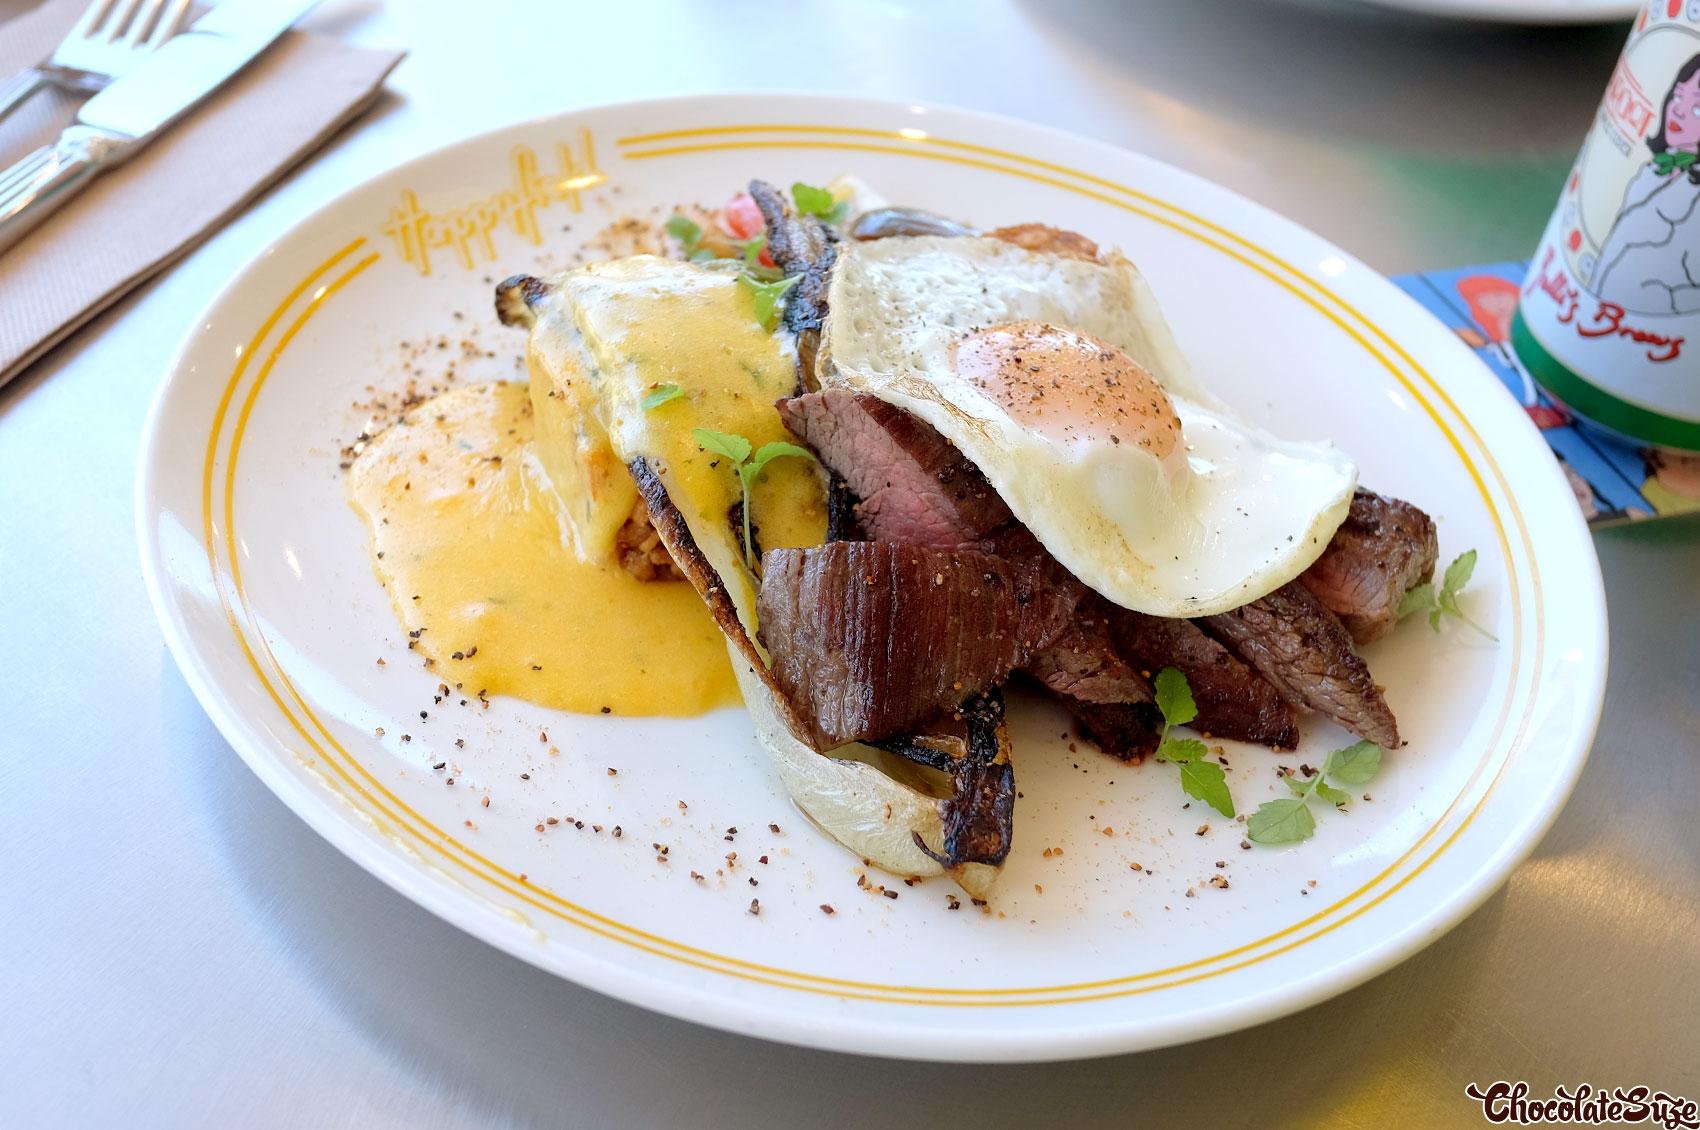 Steak and eggs at Happyfield, Haberfield